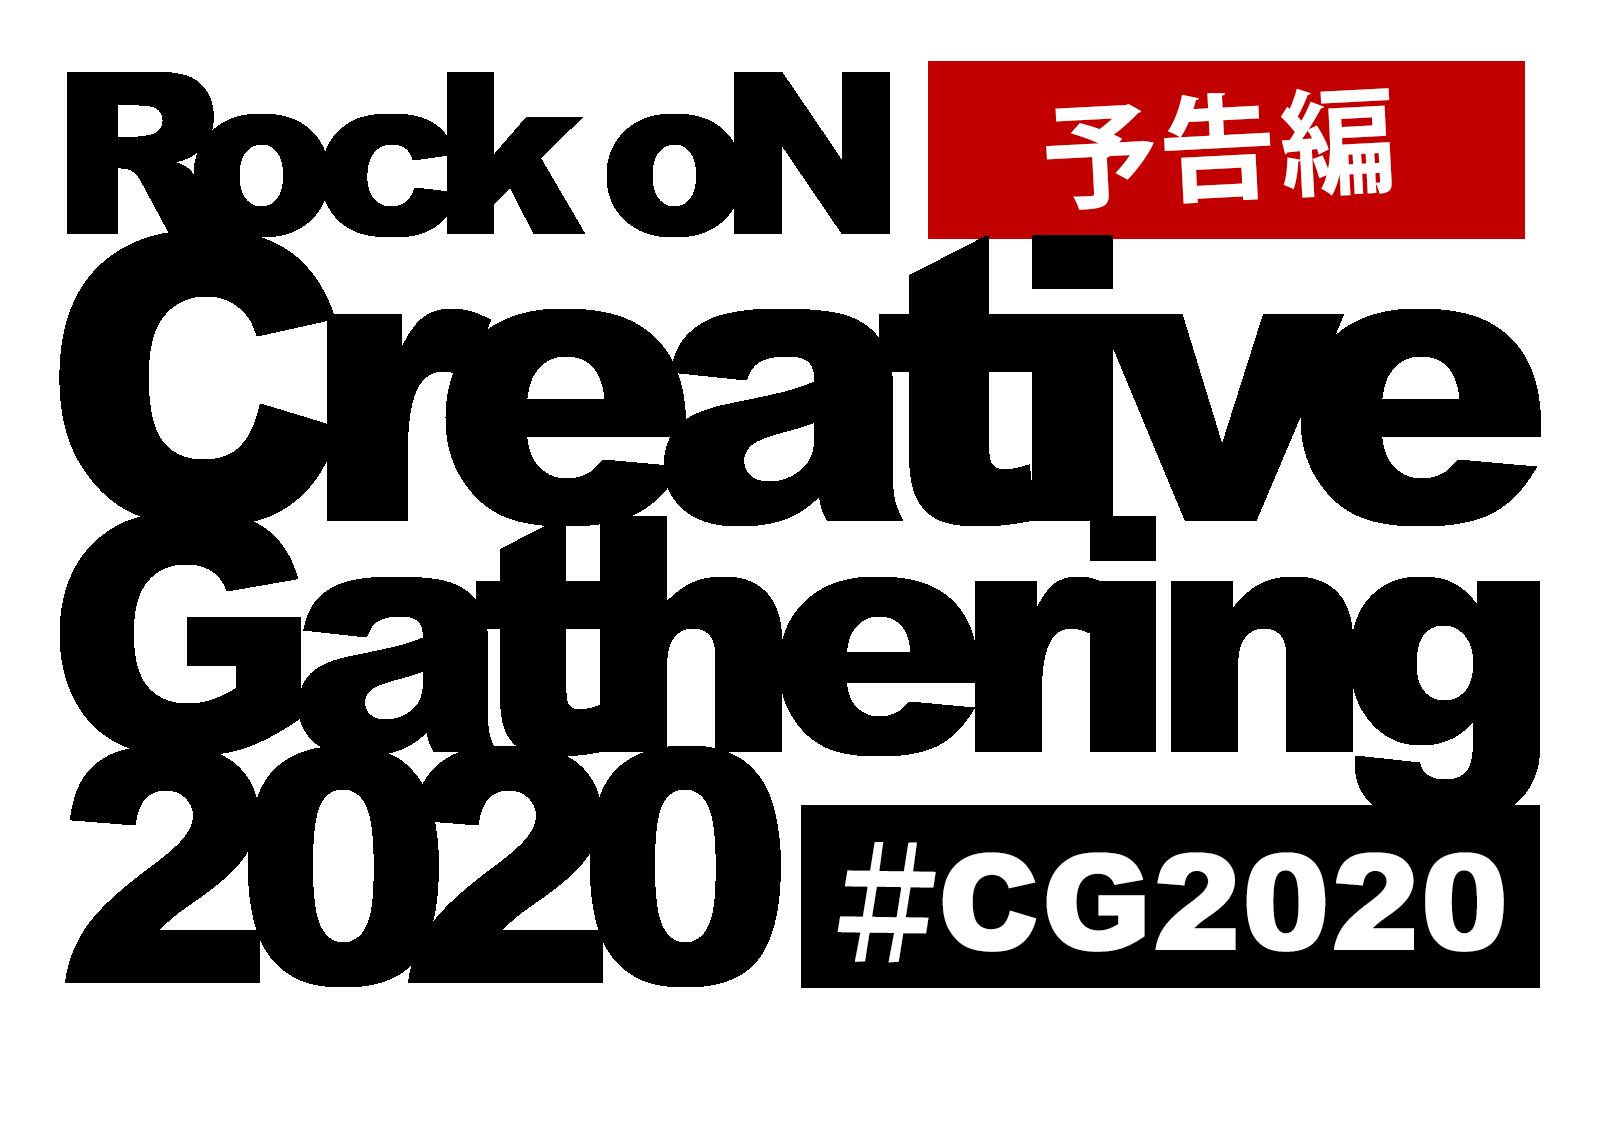 RockoN Creative Gathering 2020